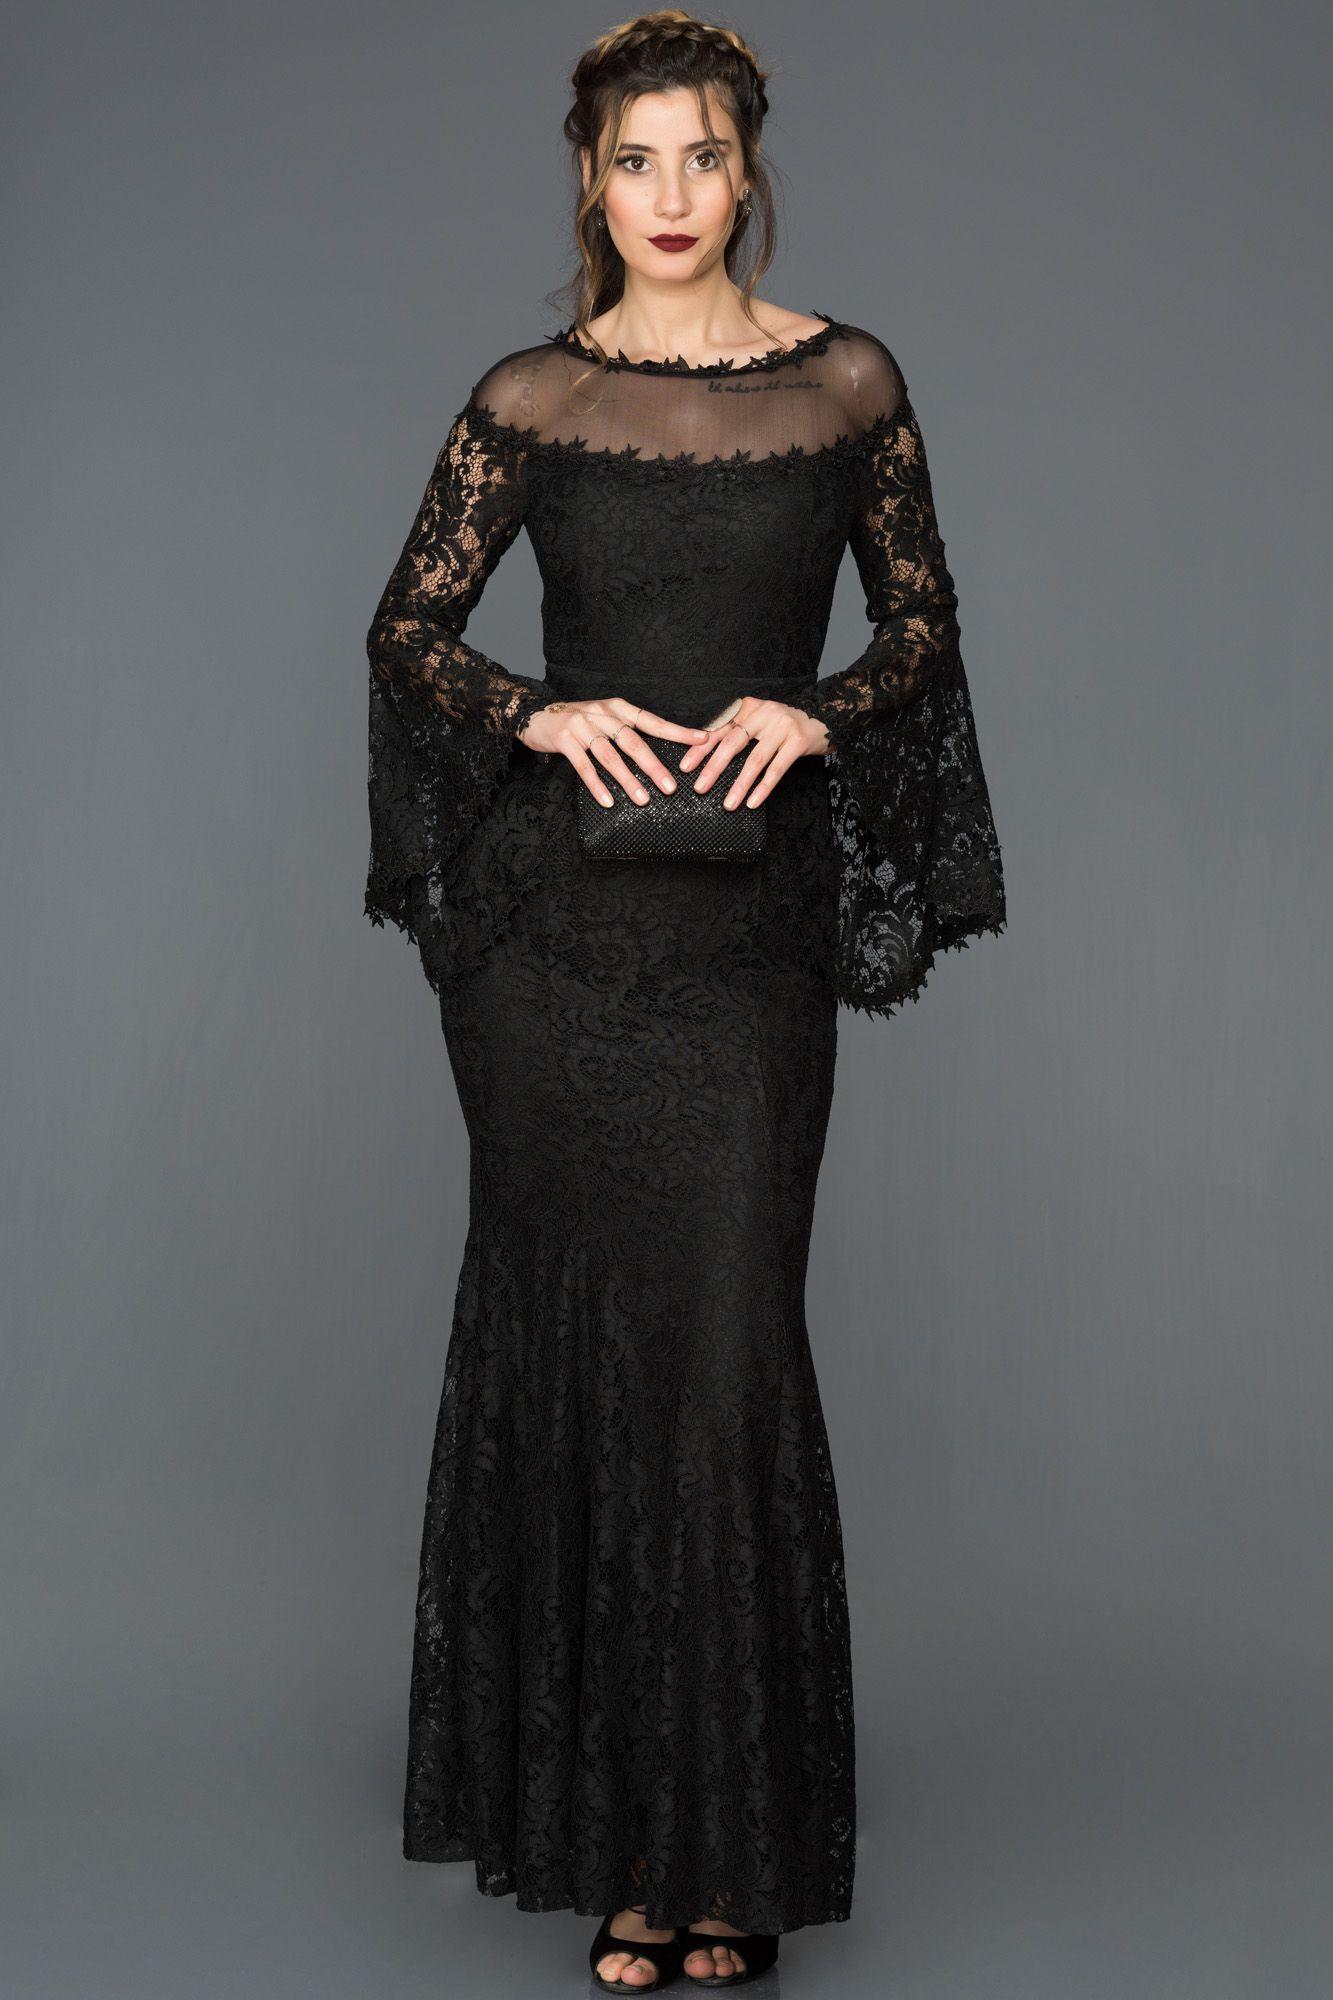 Siyah Dantelli Uzun Elbise ABU164  1f1fdfdd1250